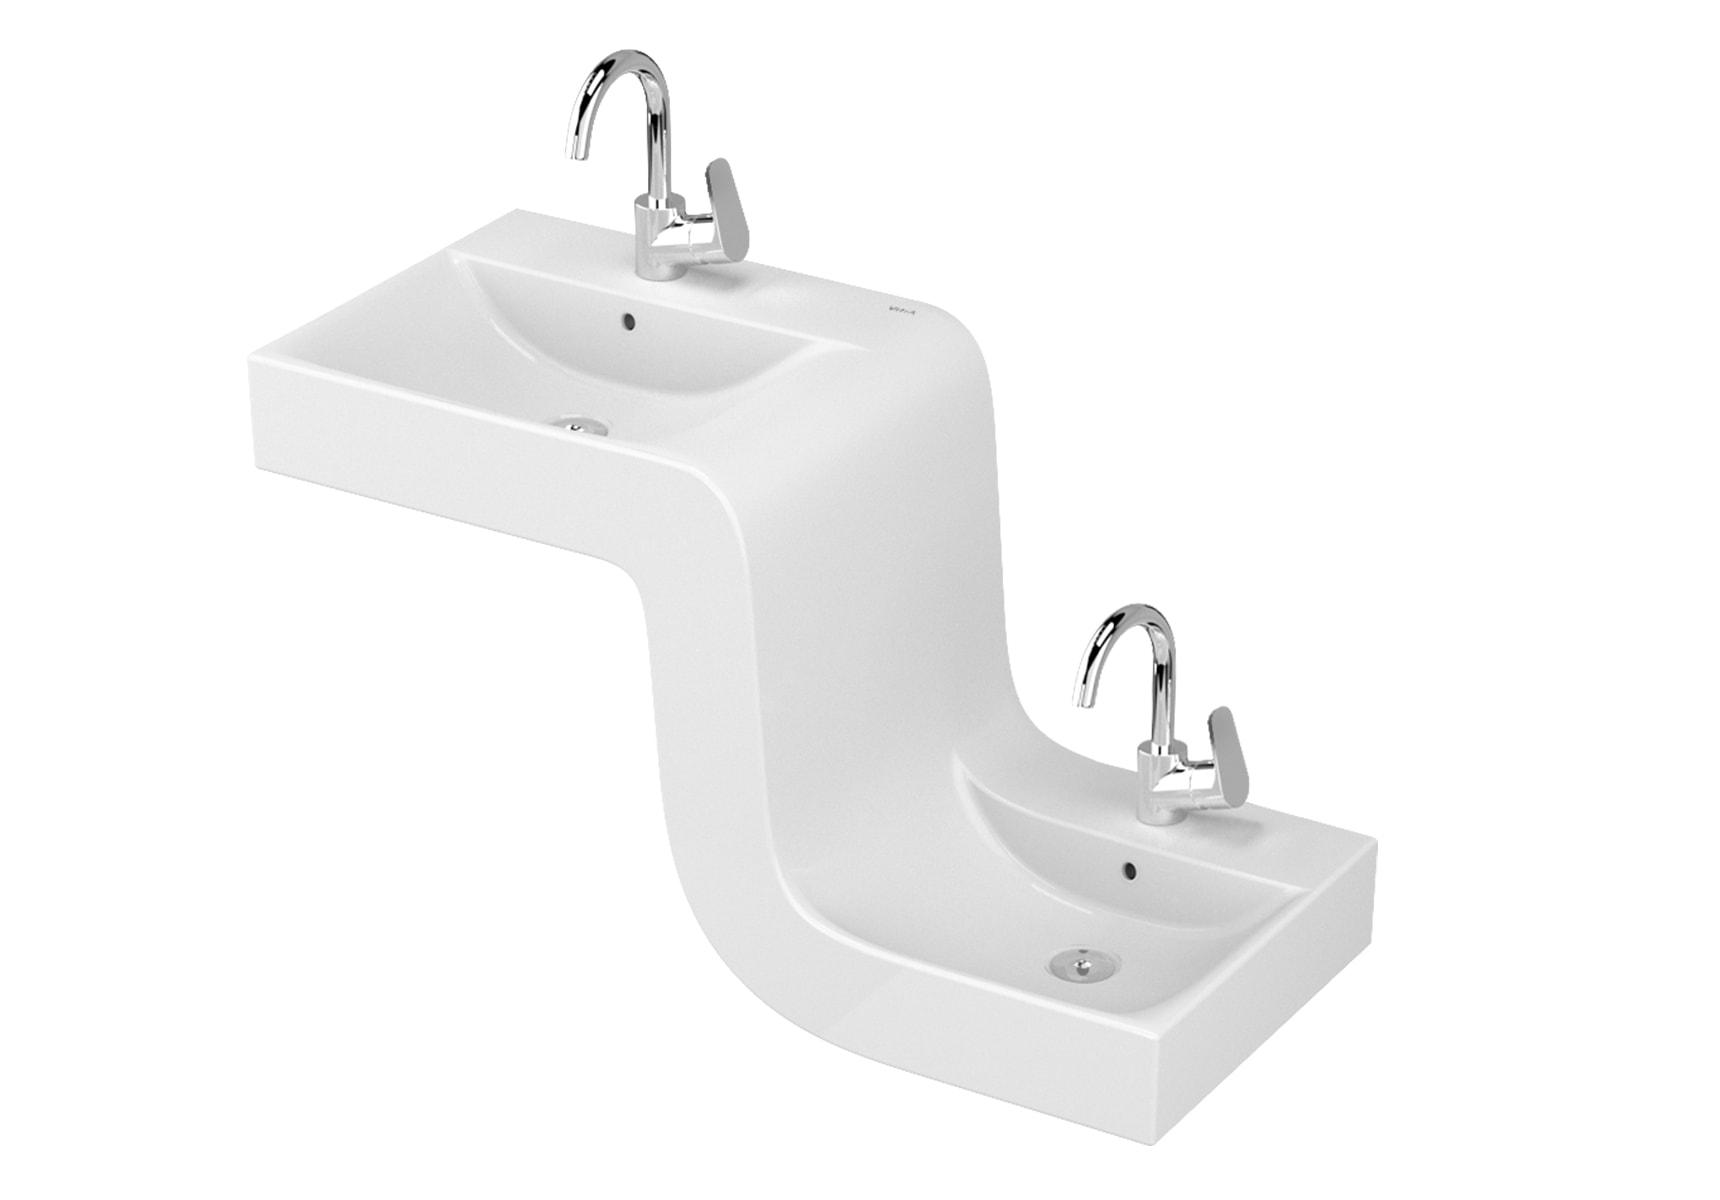 Family Covered Acrylic Washbasin-Plastic Siphon